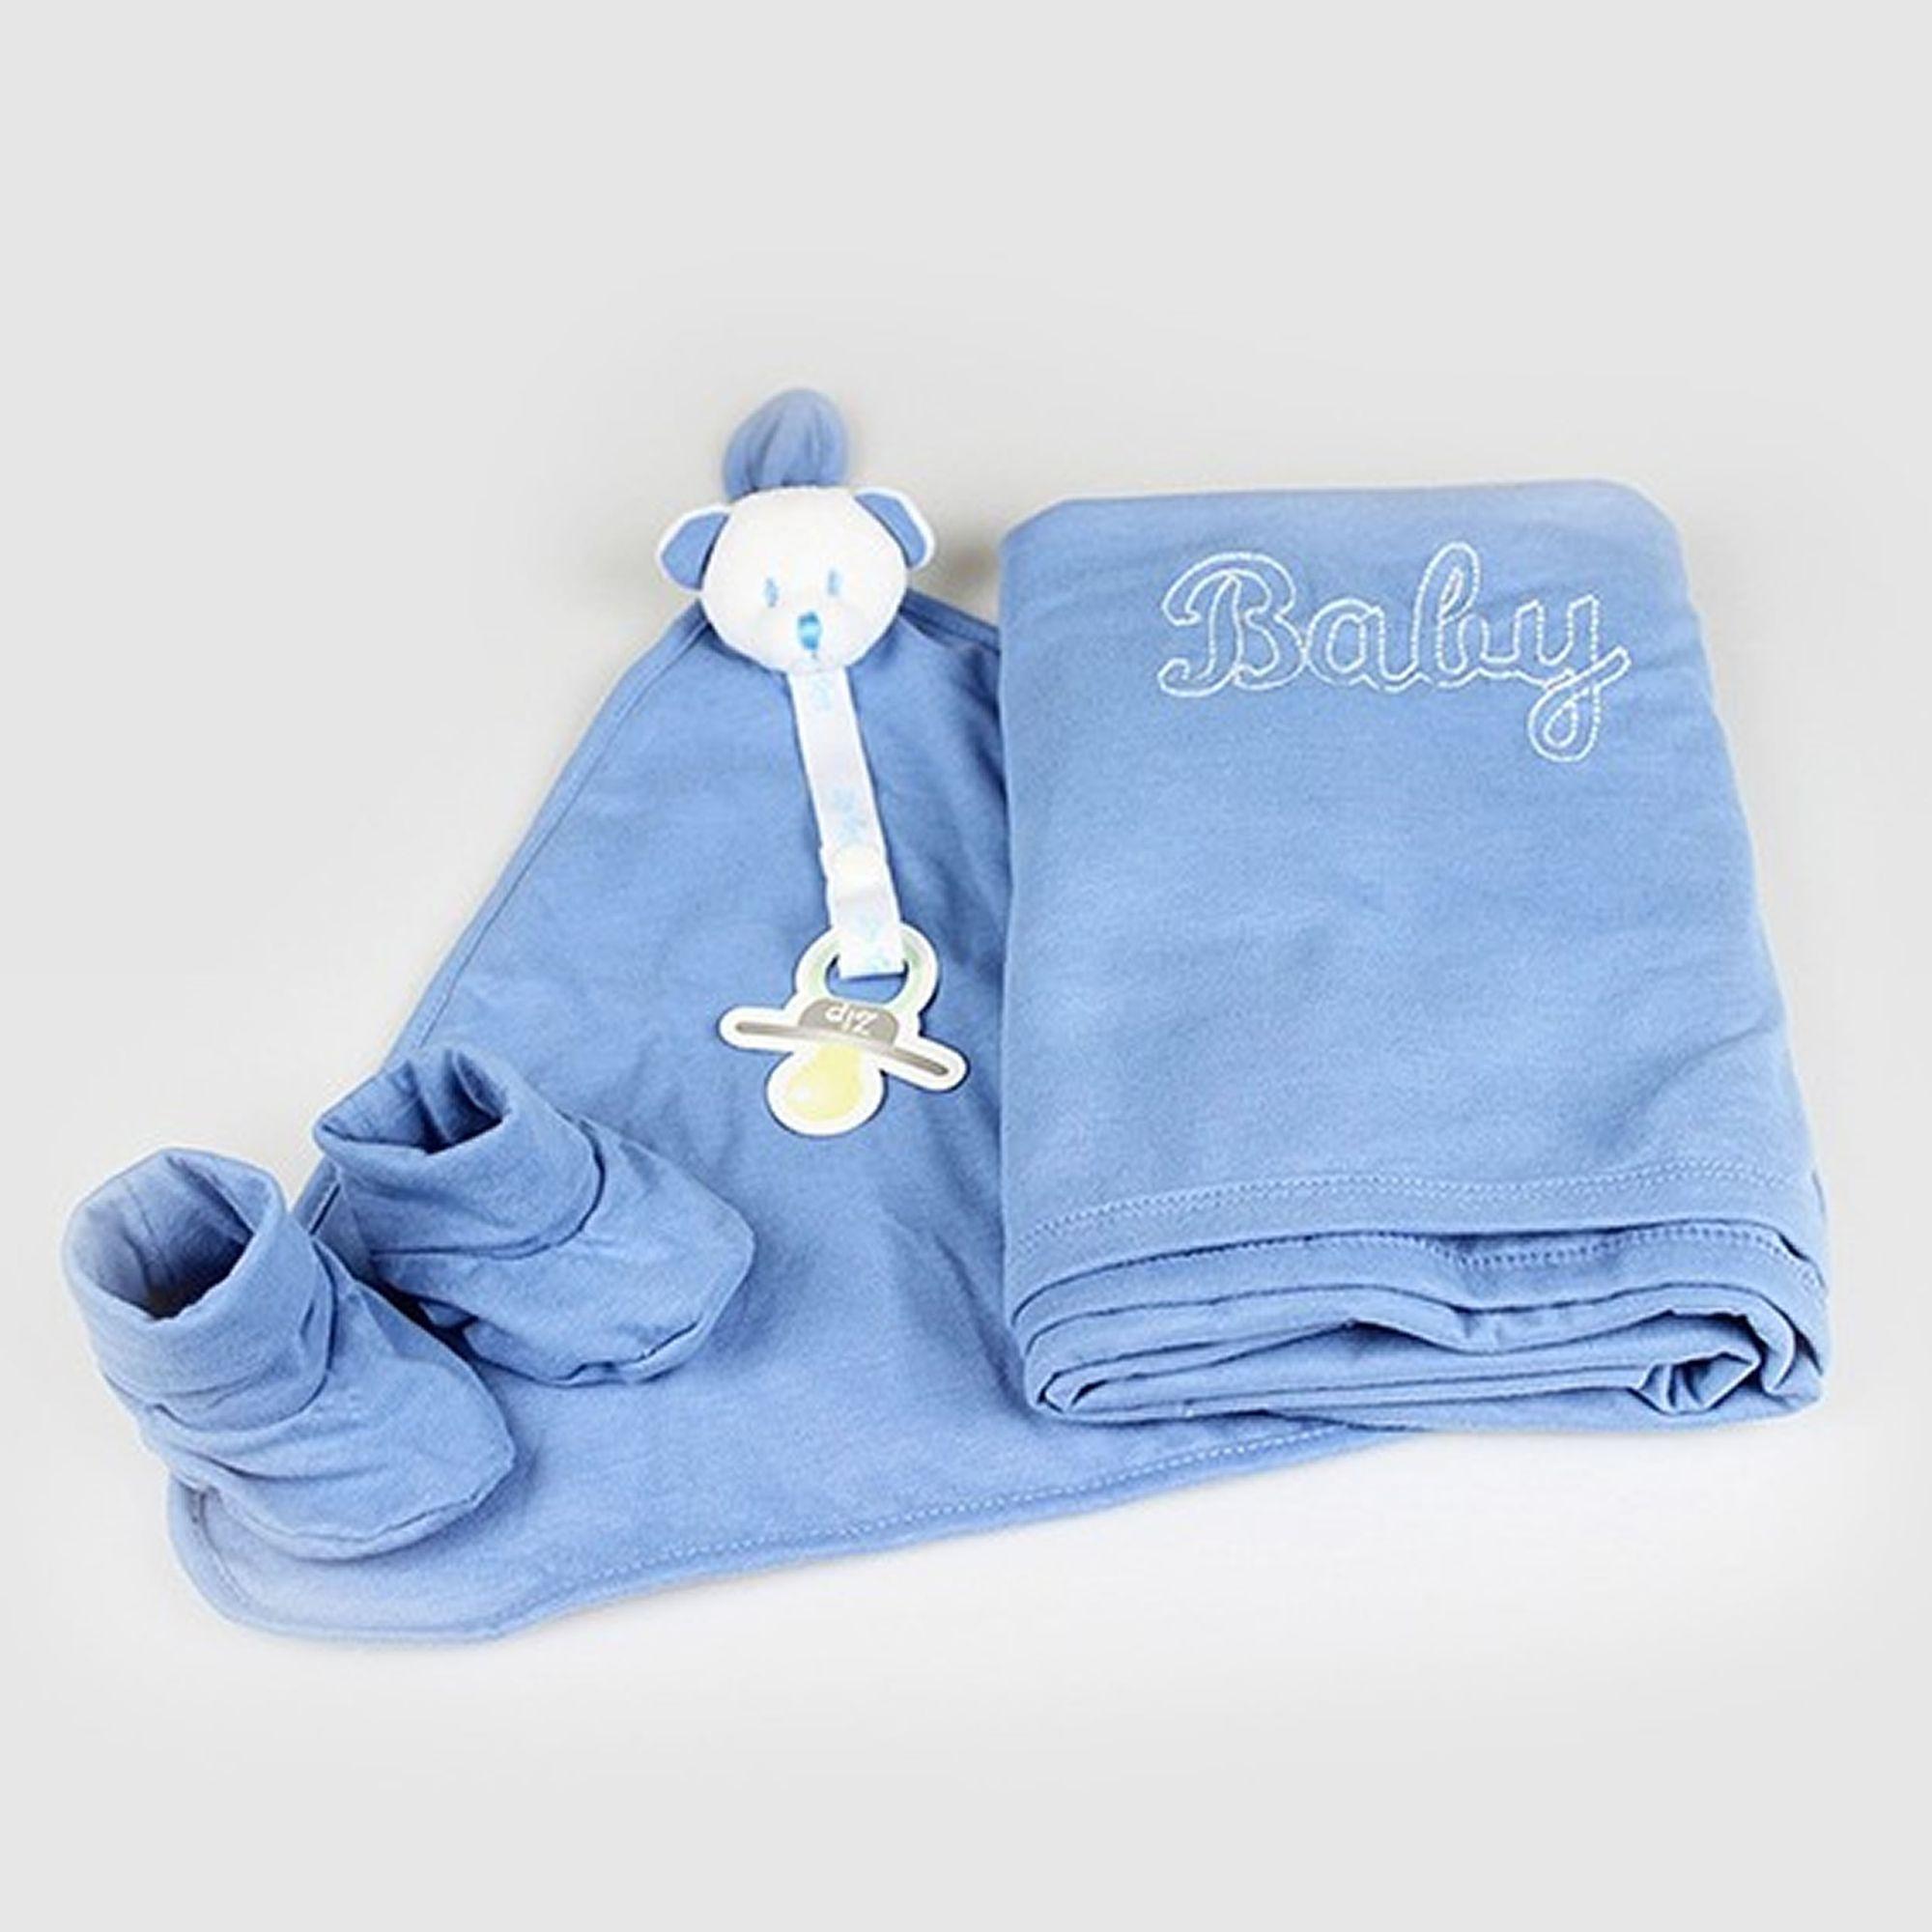 kit-presente-baby-algodao-egipcio-azul-zip-toys